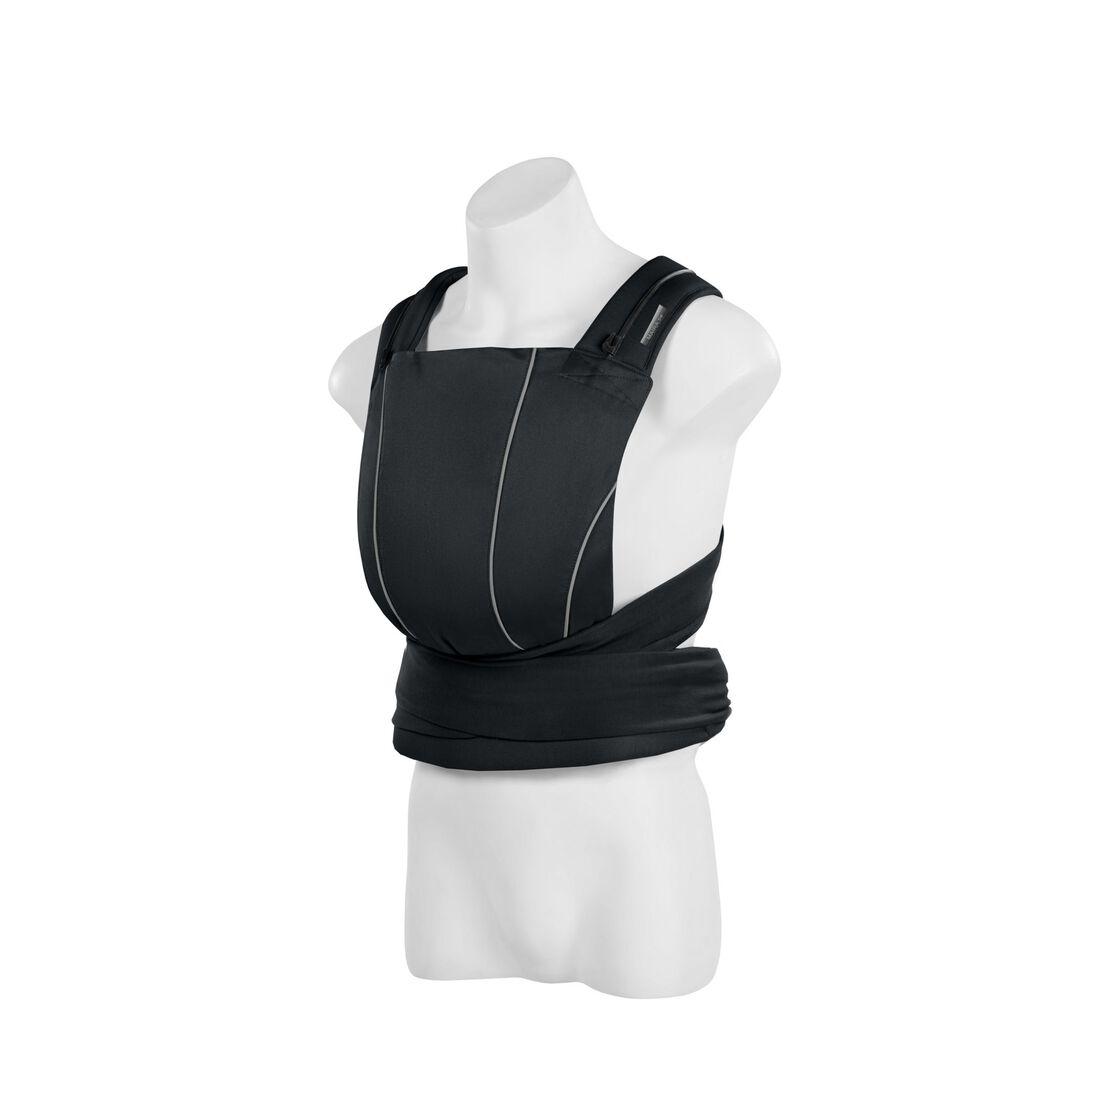 CYBEX Maira Tie - Lavastone Black in Lavastone Black large Bild 2